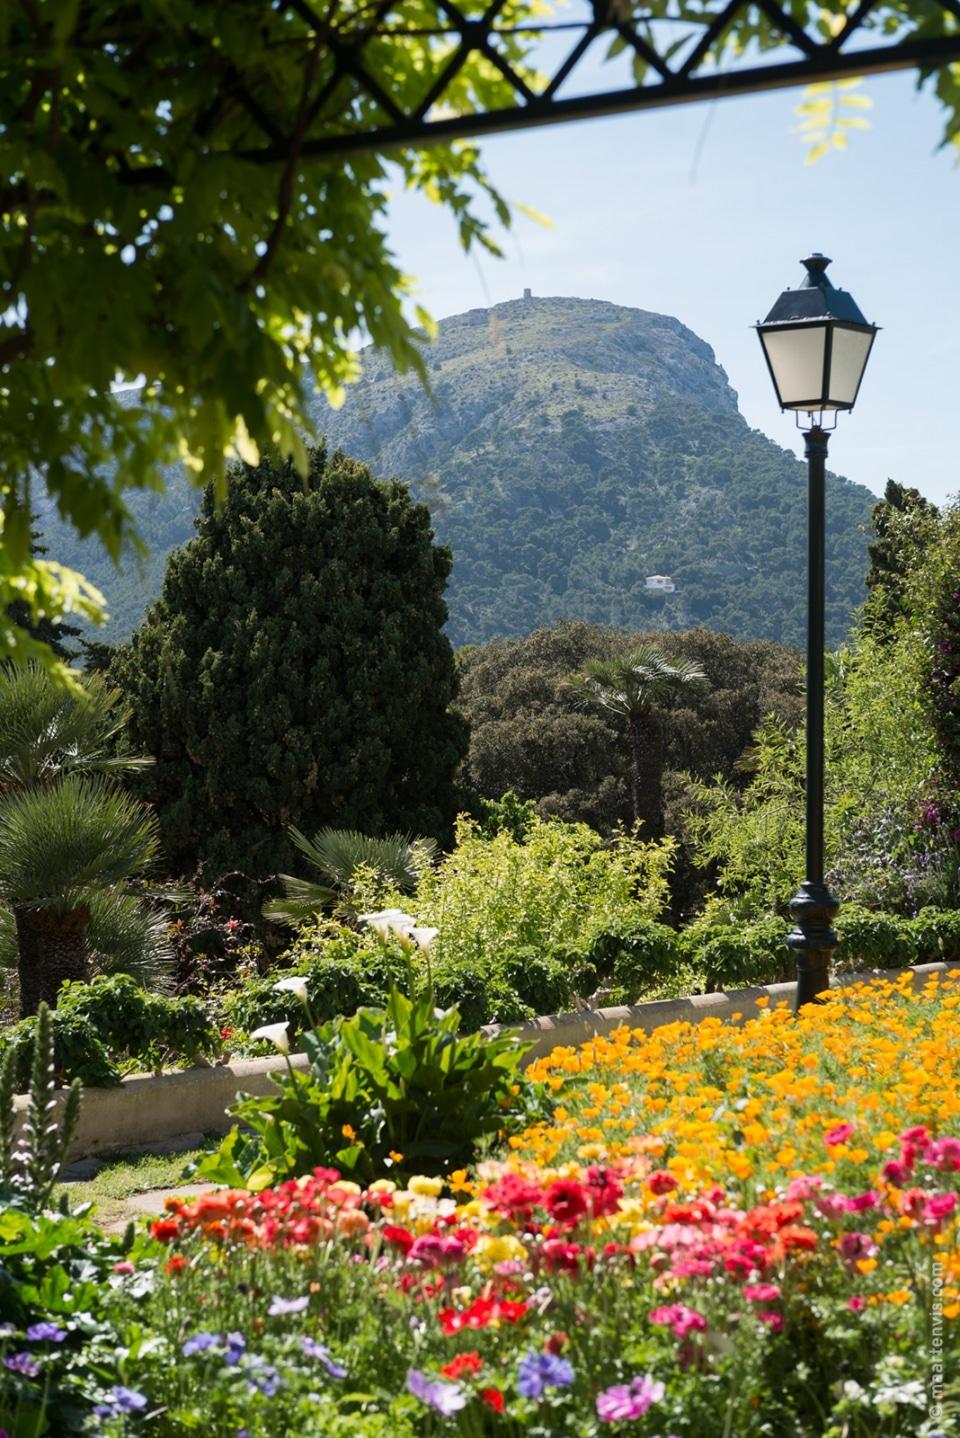 20140429 9385 960x1438 - Hotel Formentor in Spring